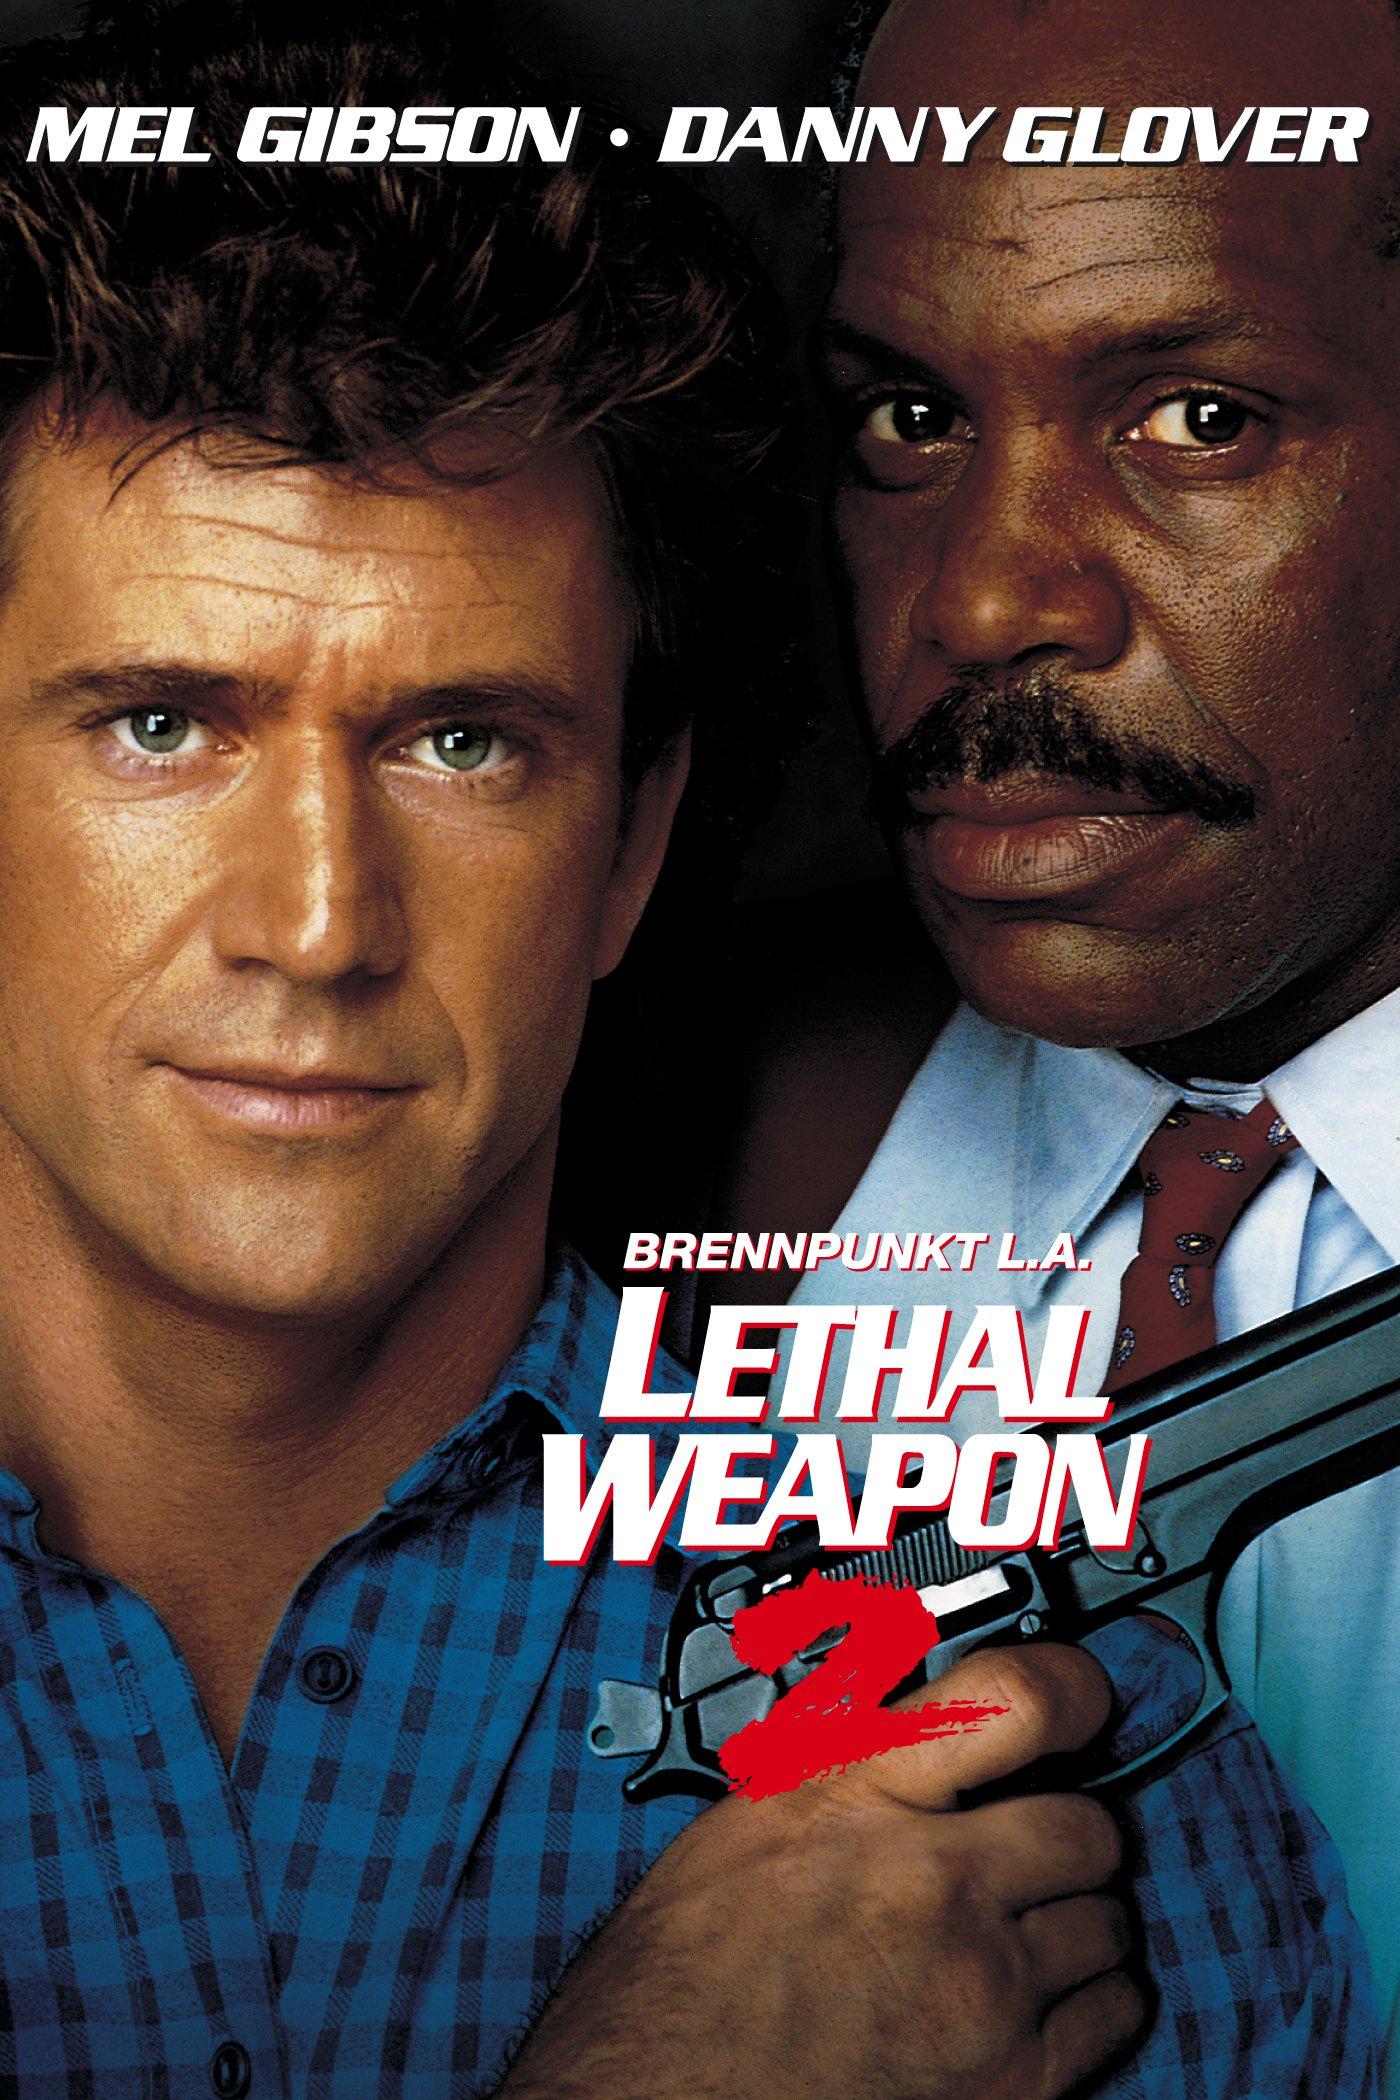 """Lethal Weapon 2 - Brennpunkt L.A."""